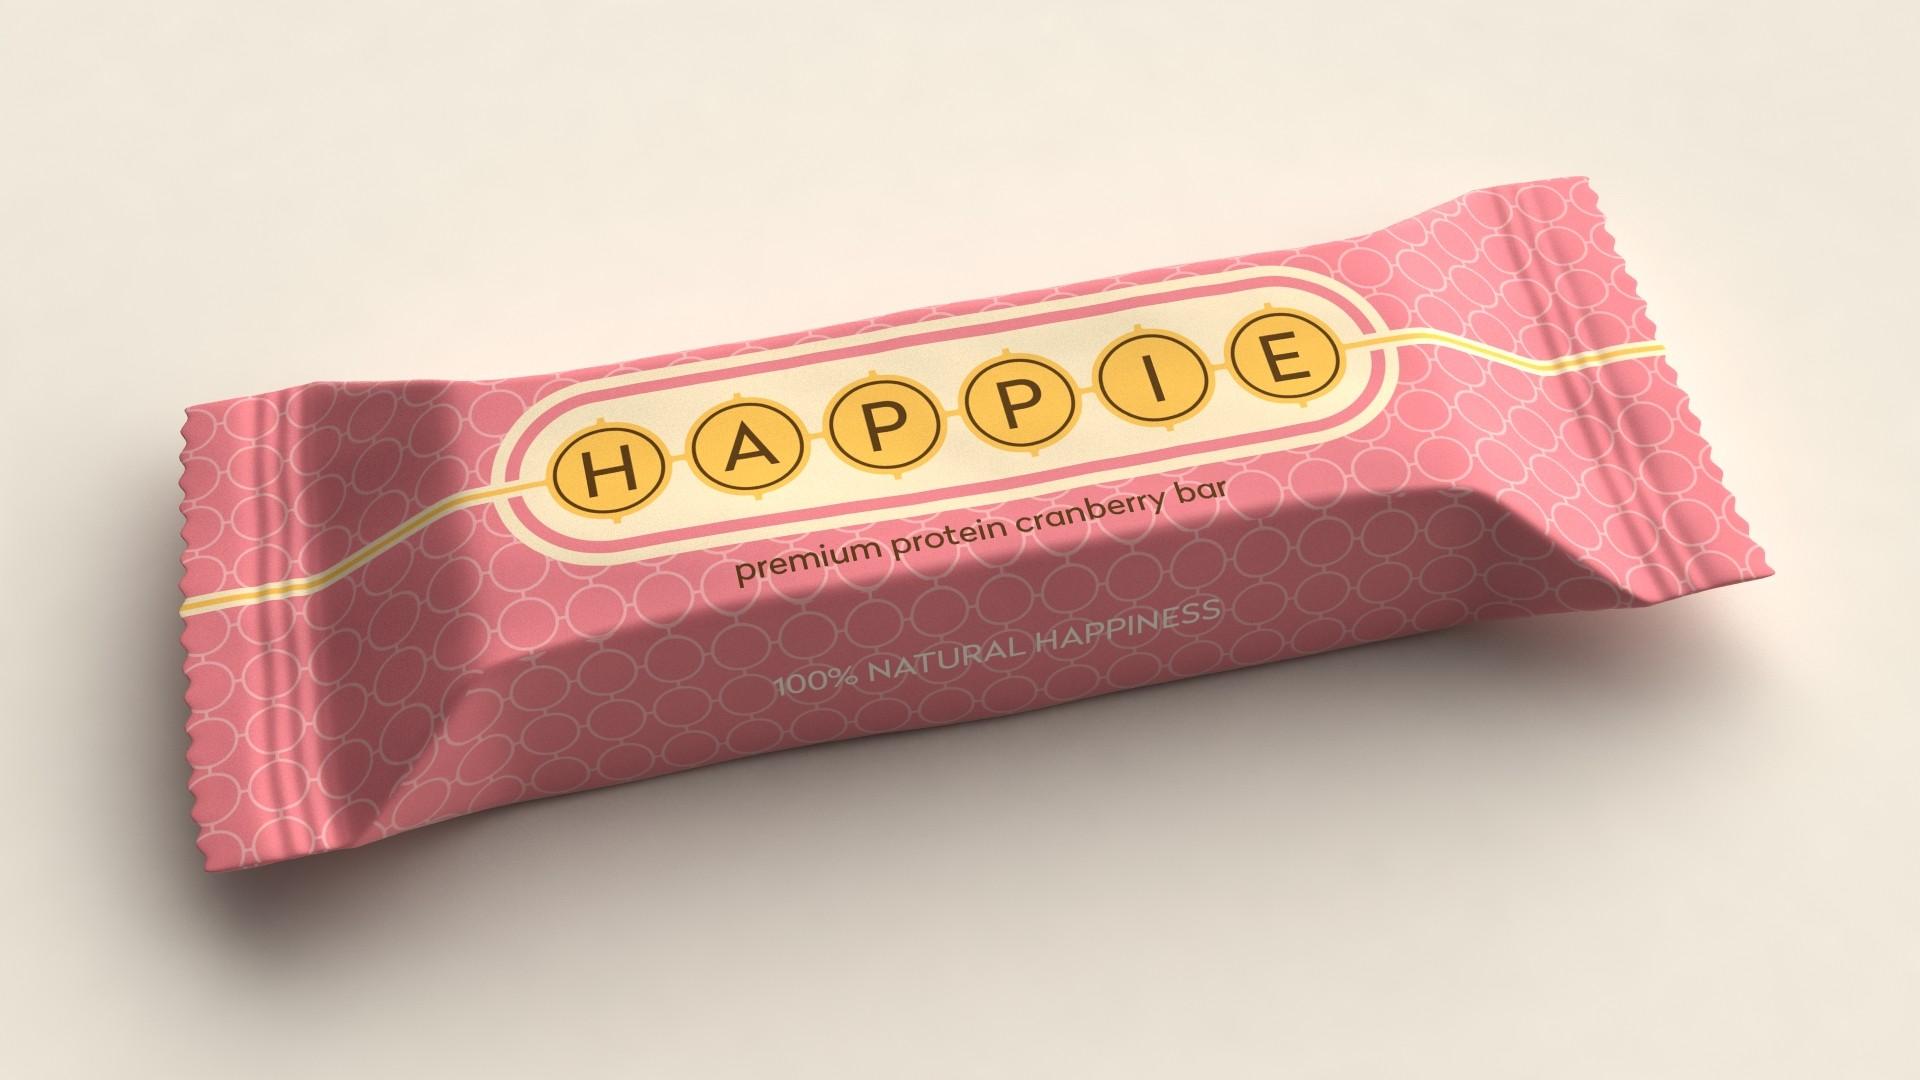 Happie Protein Cranberry Bar ds. 12st. van 50gr.